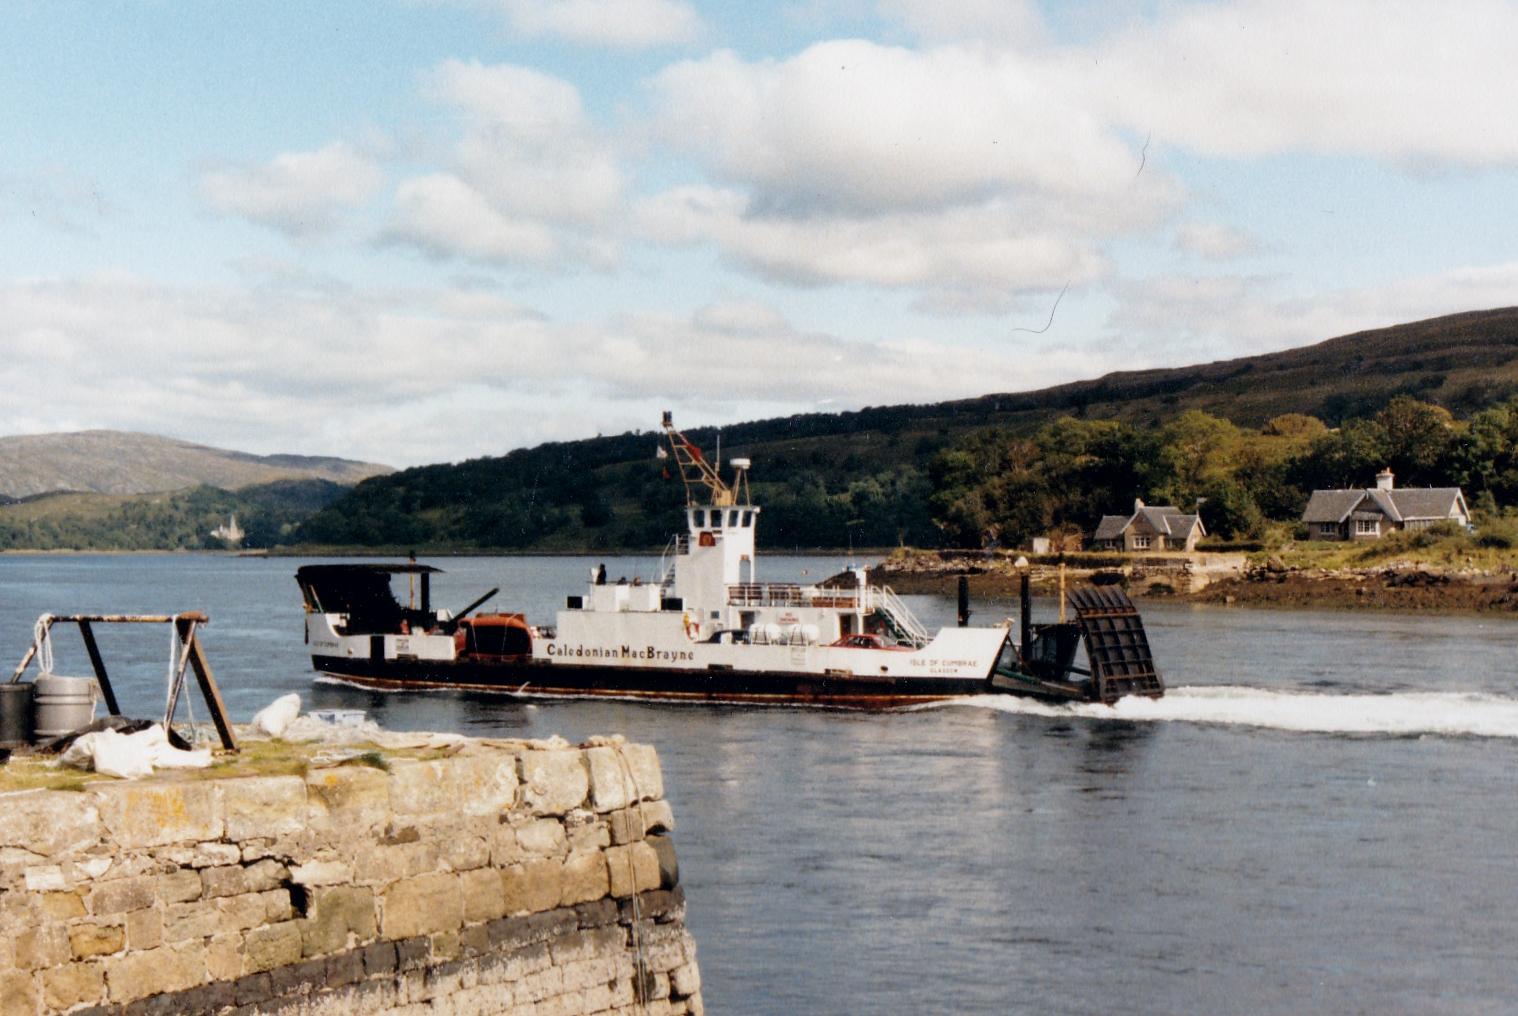 Isle of Cumbrae arriving at Lochaline (Jim Aikman Smith)